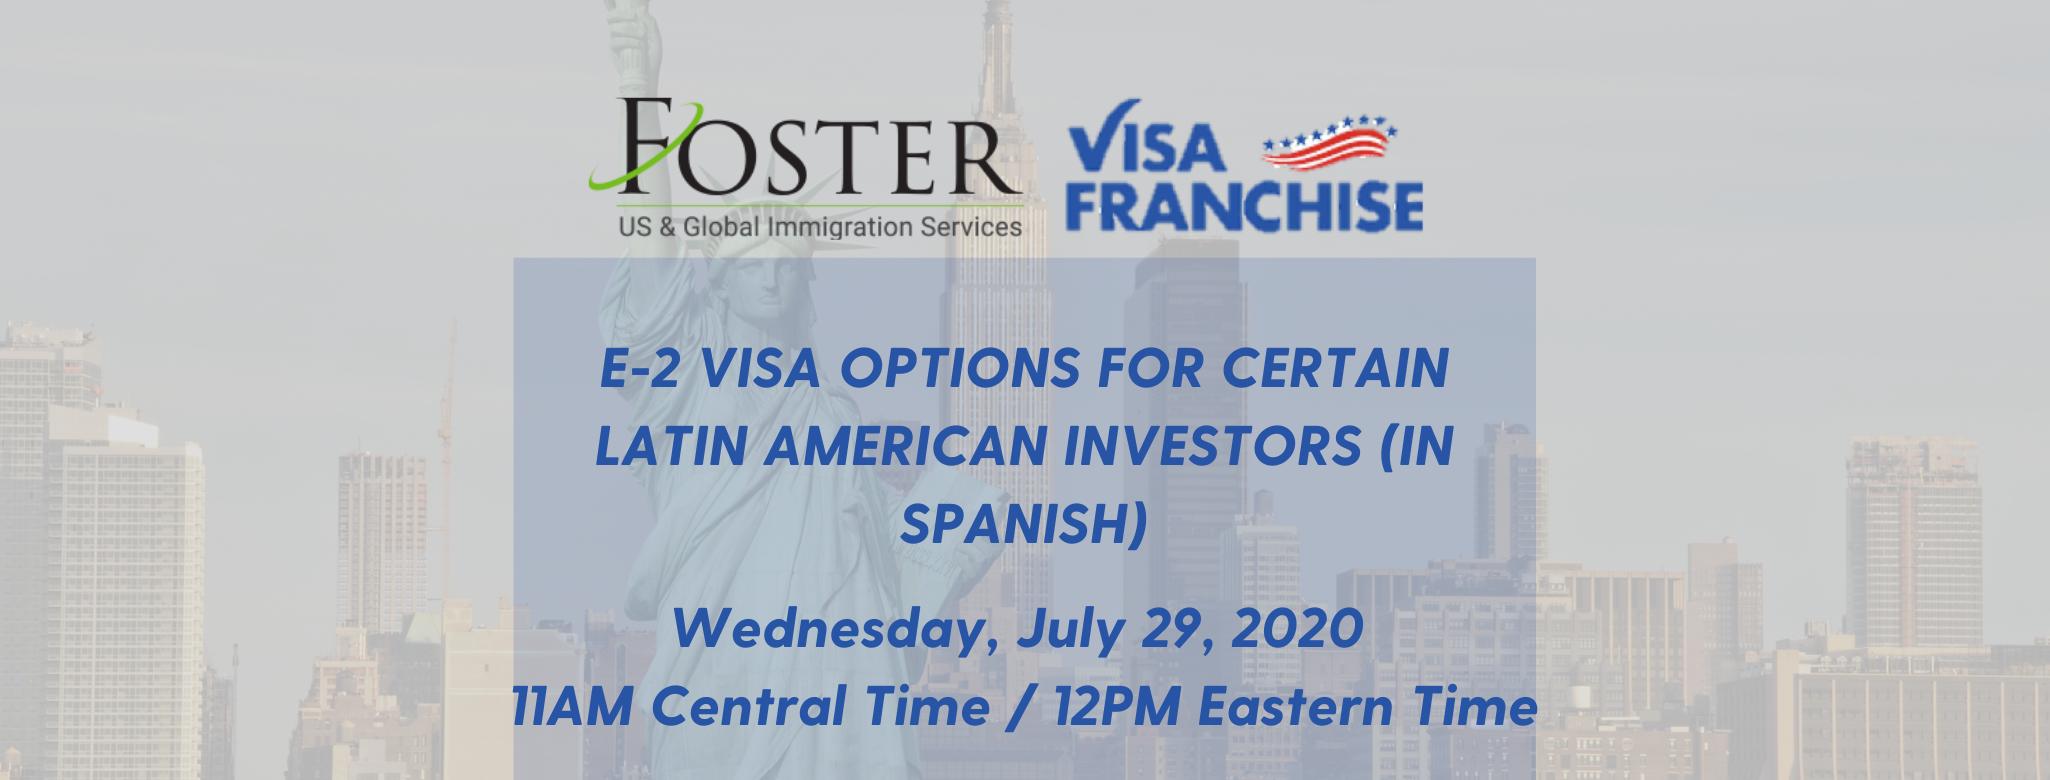 Foster Global Visa Franchise Webinar